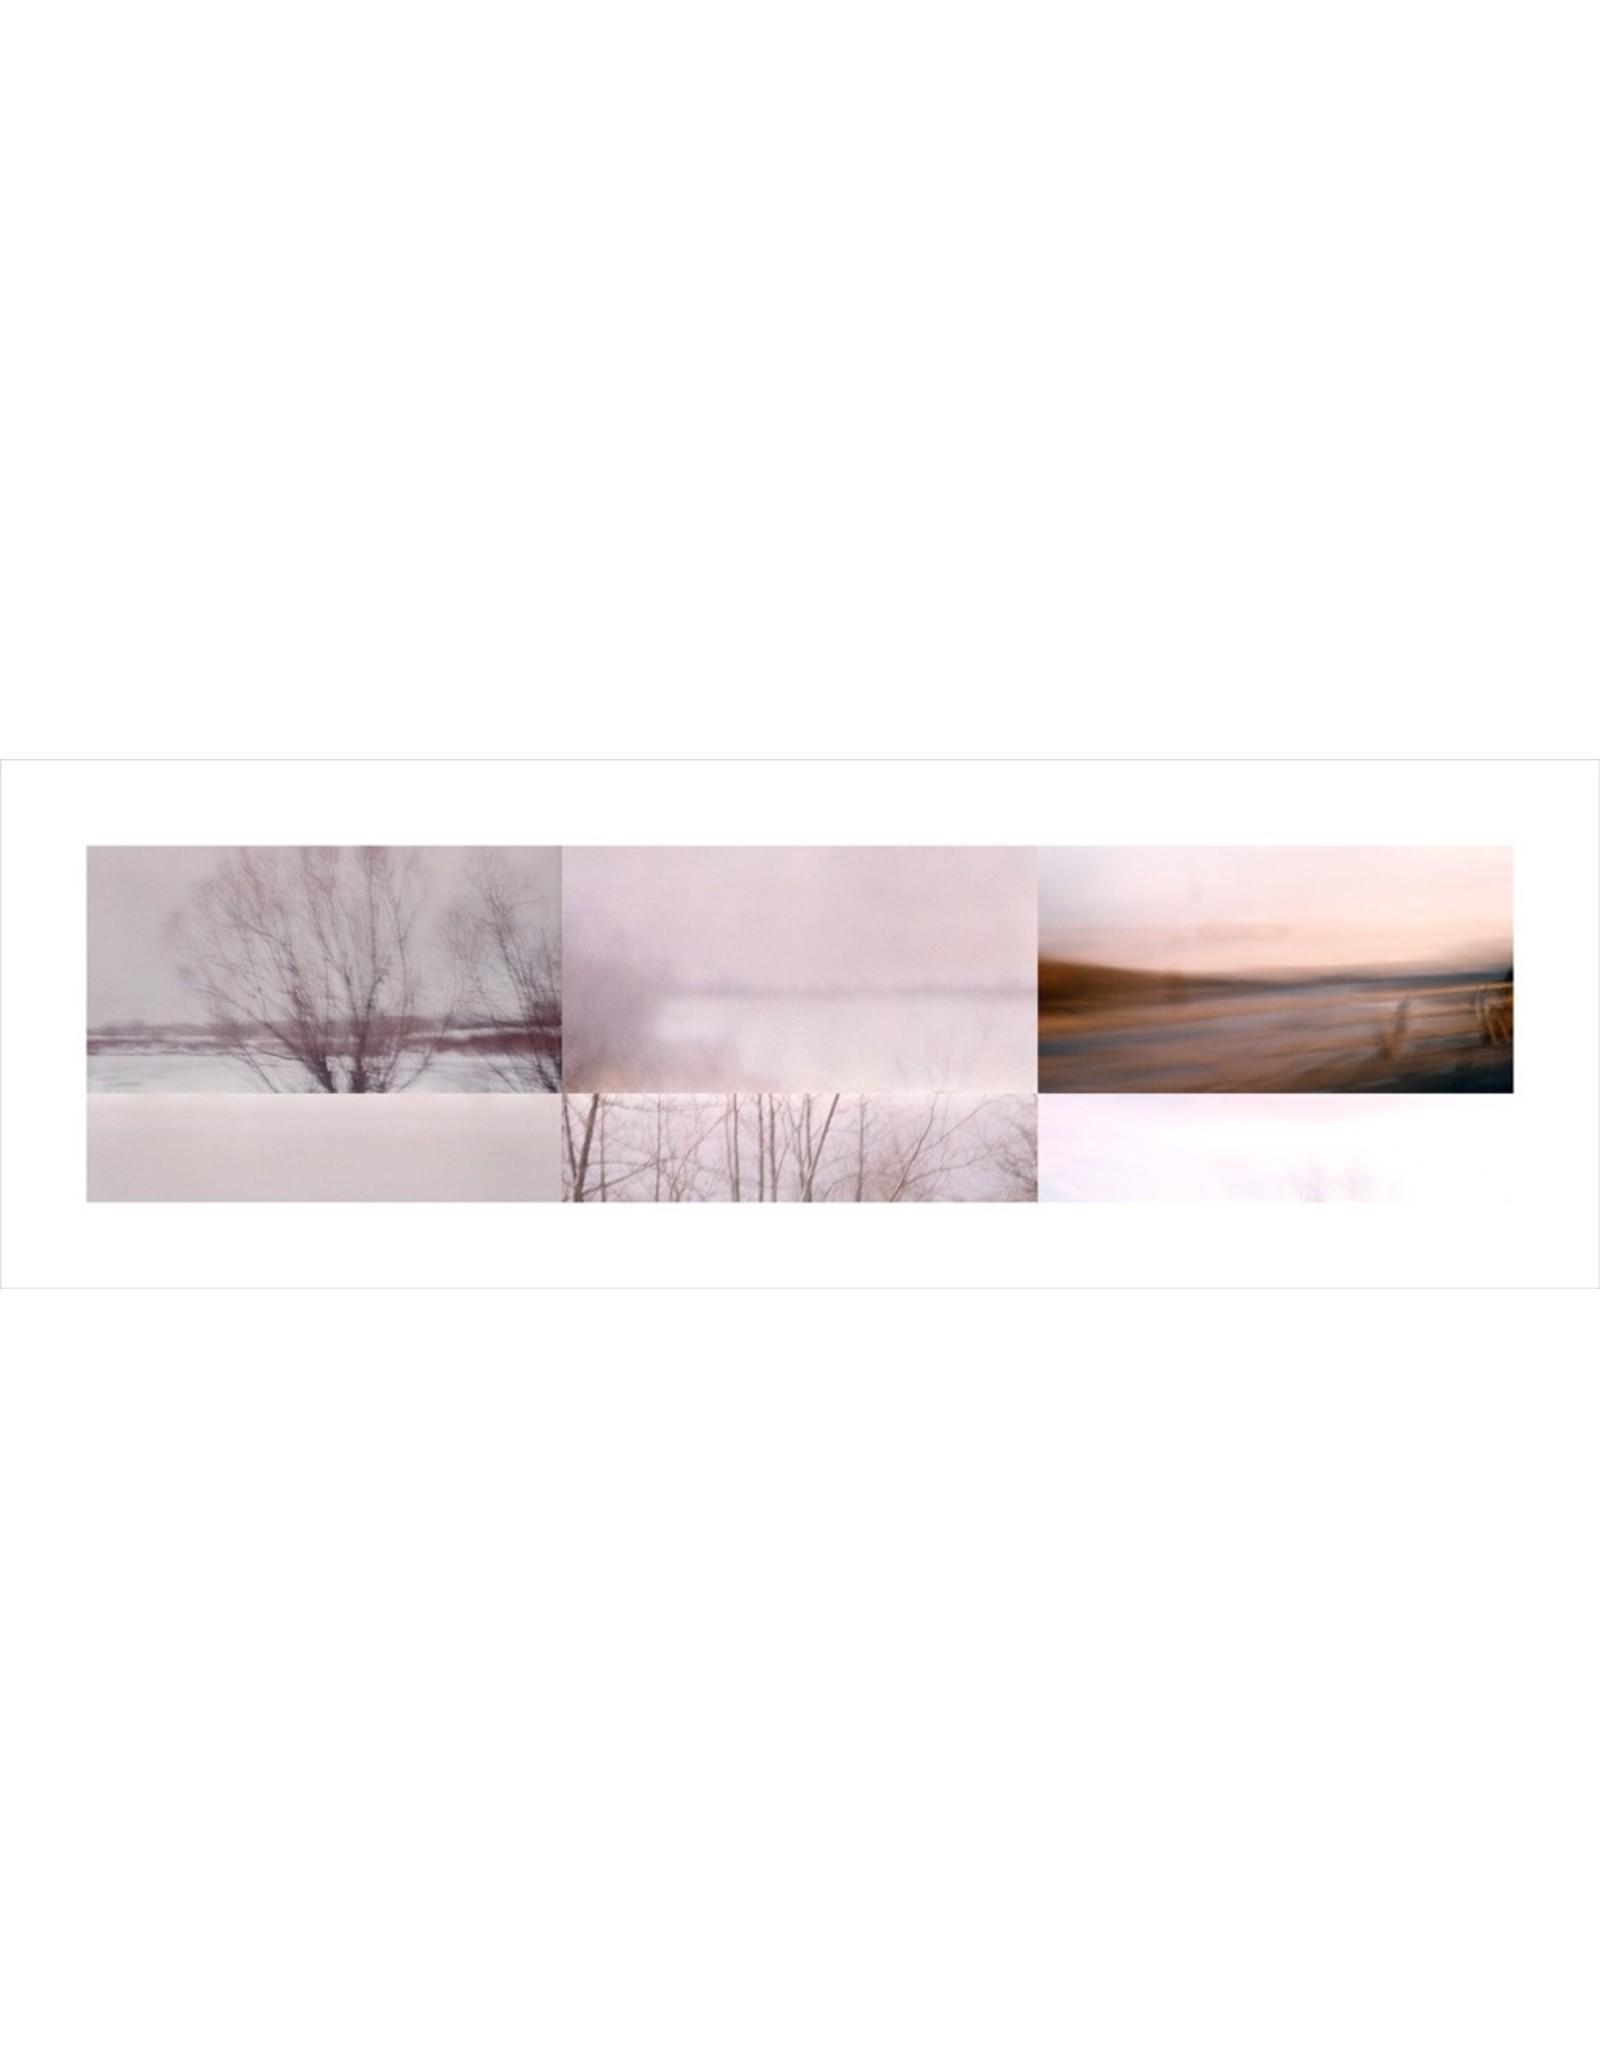 Crawley, Sarah untitled (wintersix), Sarah Crawley